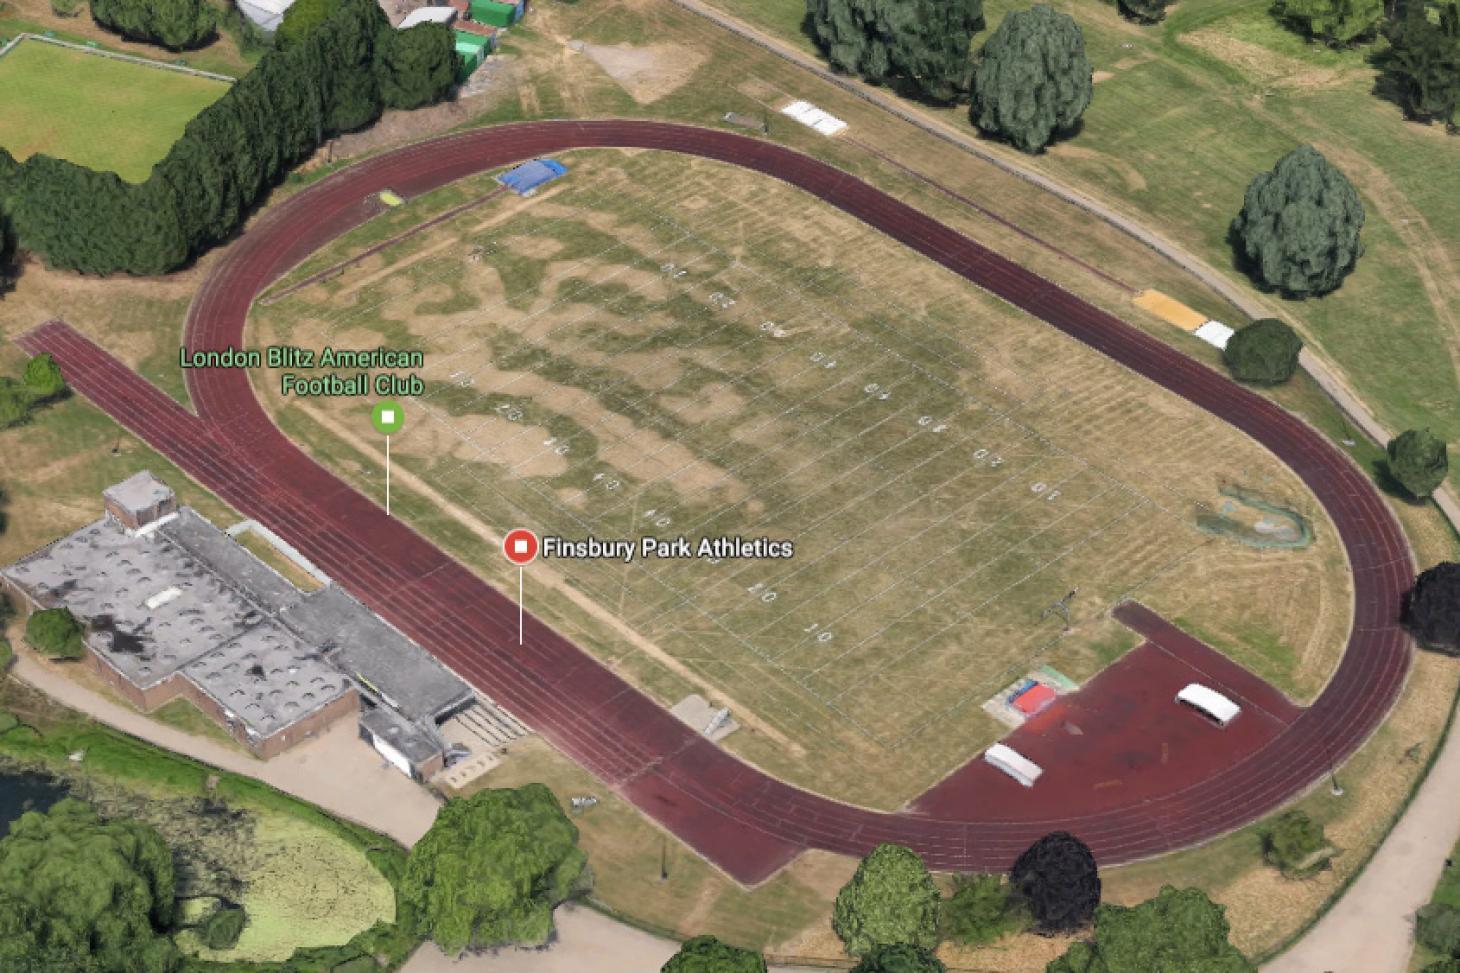 Finsbury Park Outdoor | Hard (macadam) athletics track